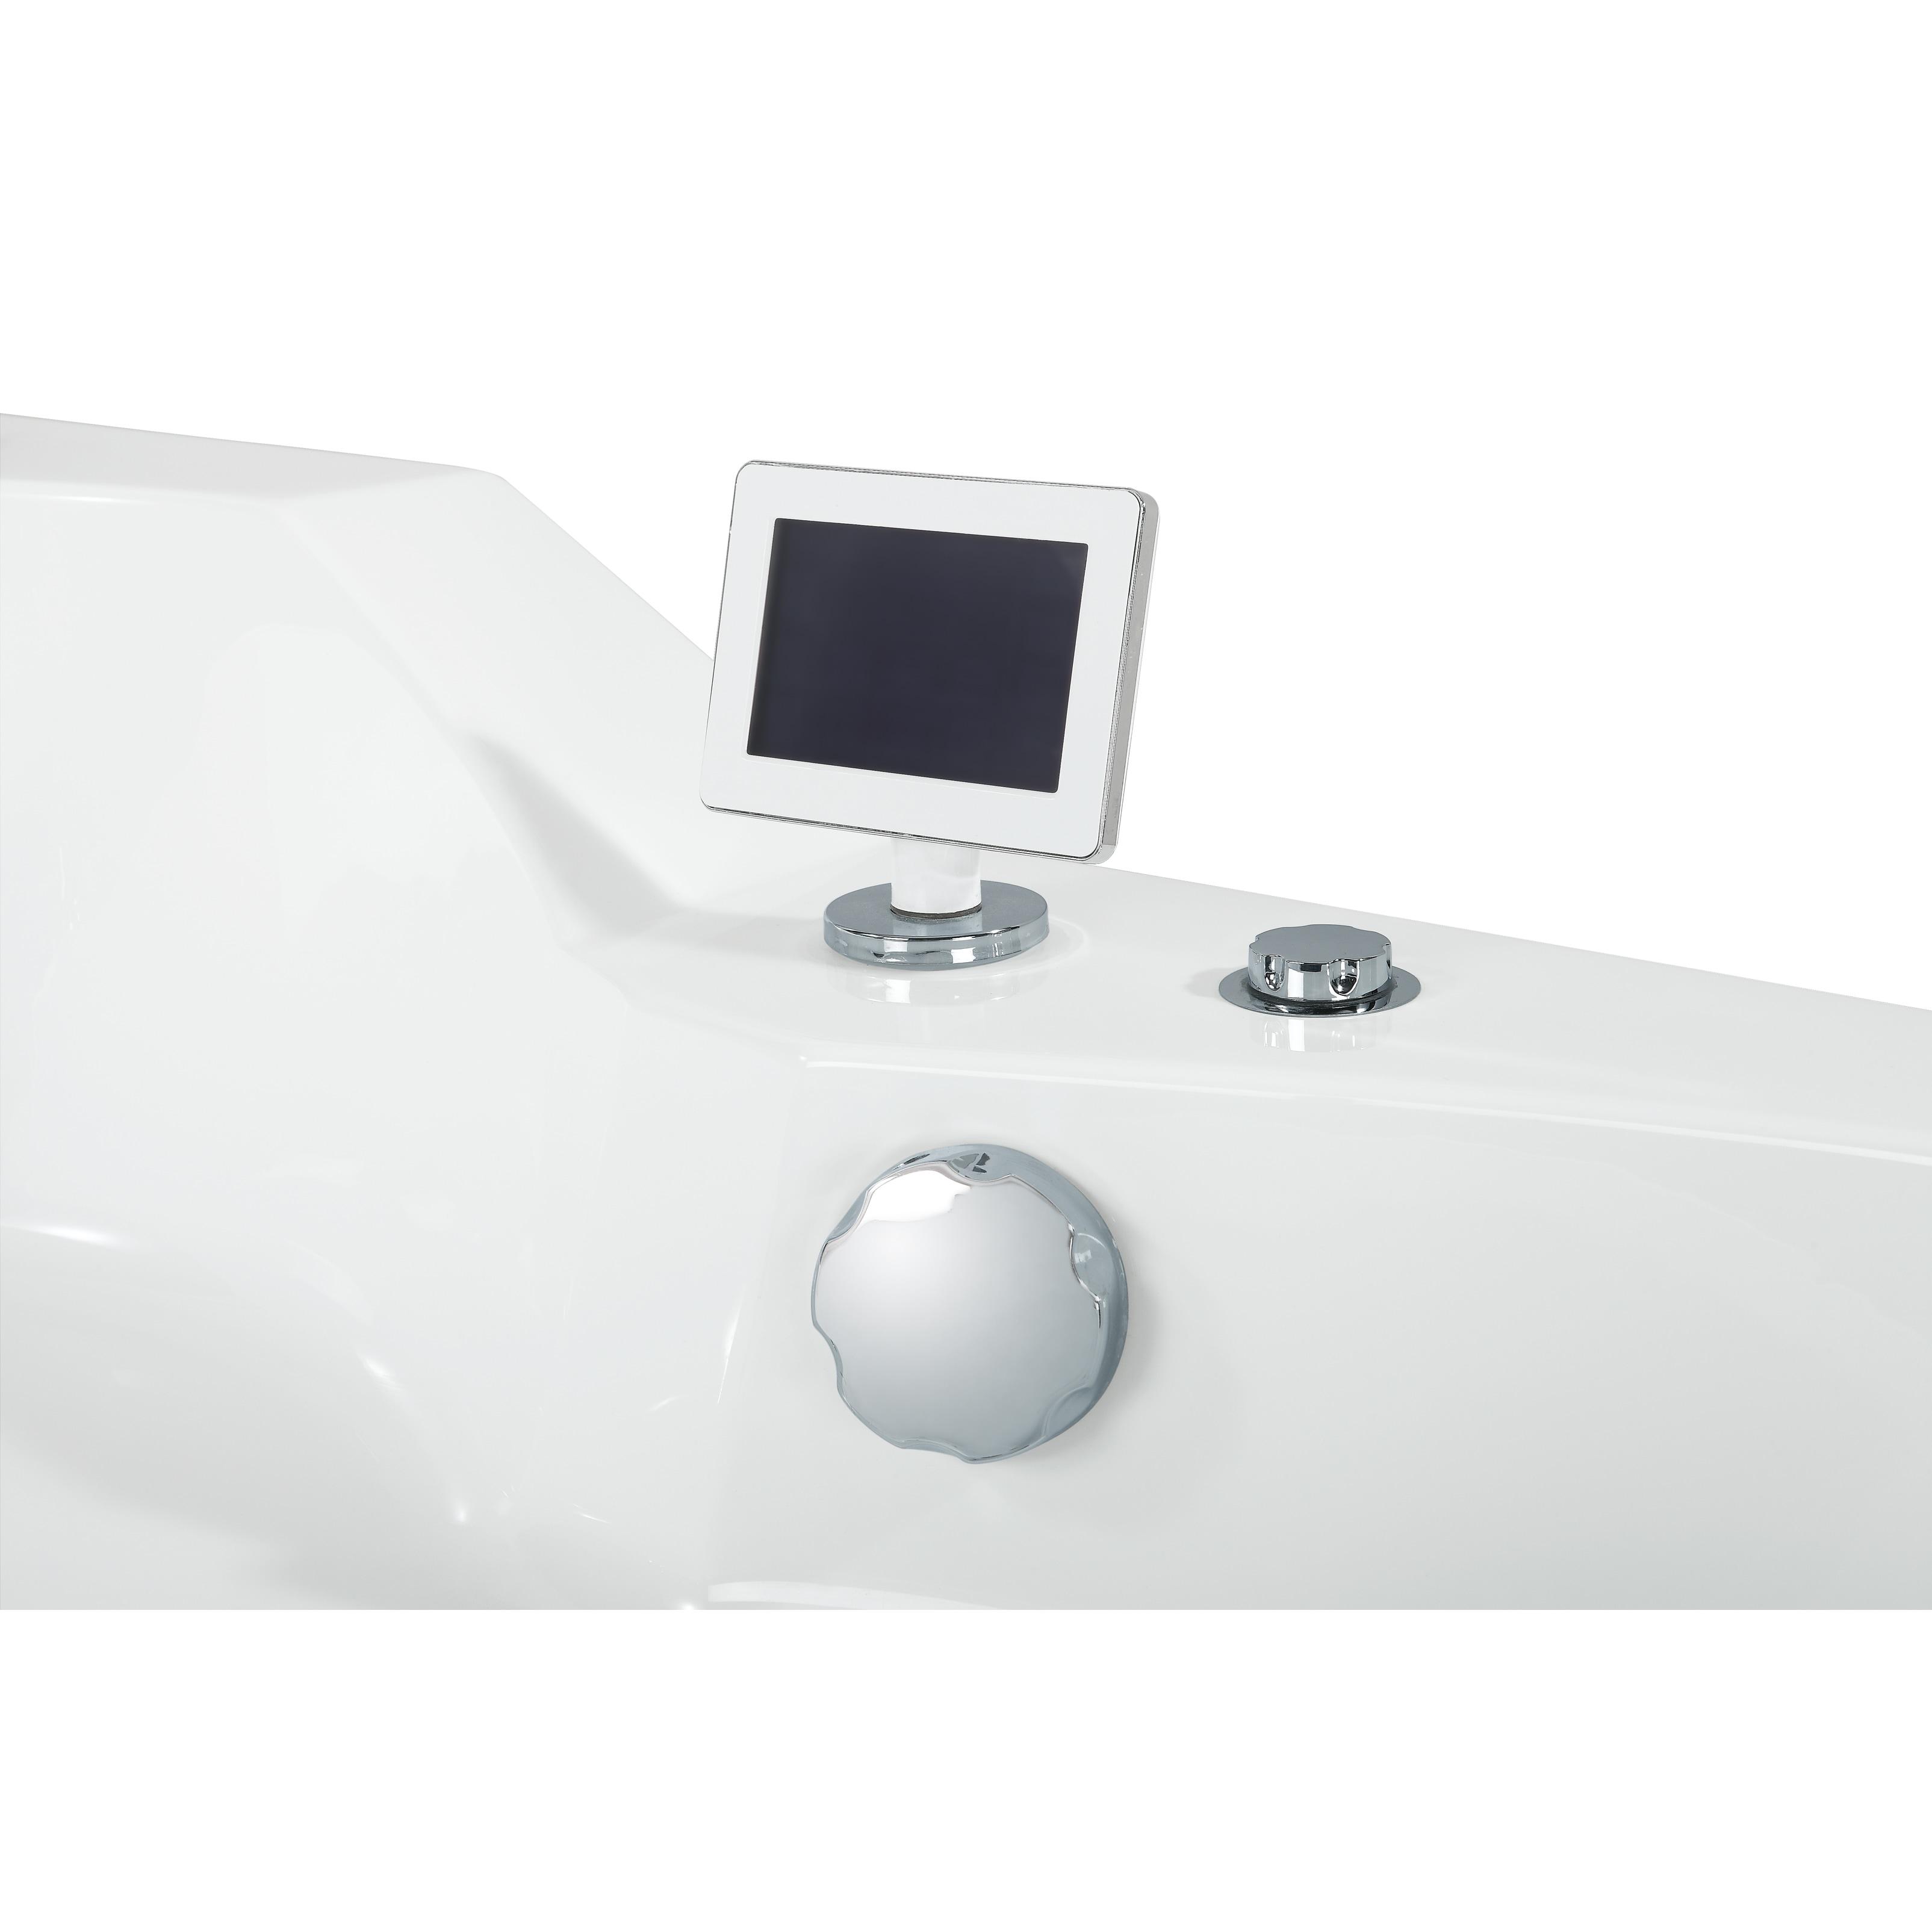 Shop Ariel ARL-084 Two Person Whirlpool Bathtub - Free Shipping ...